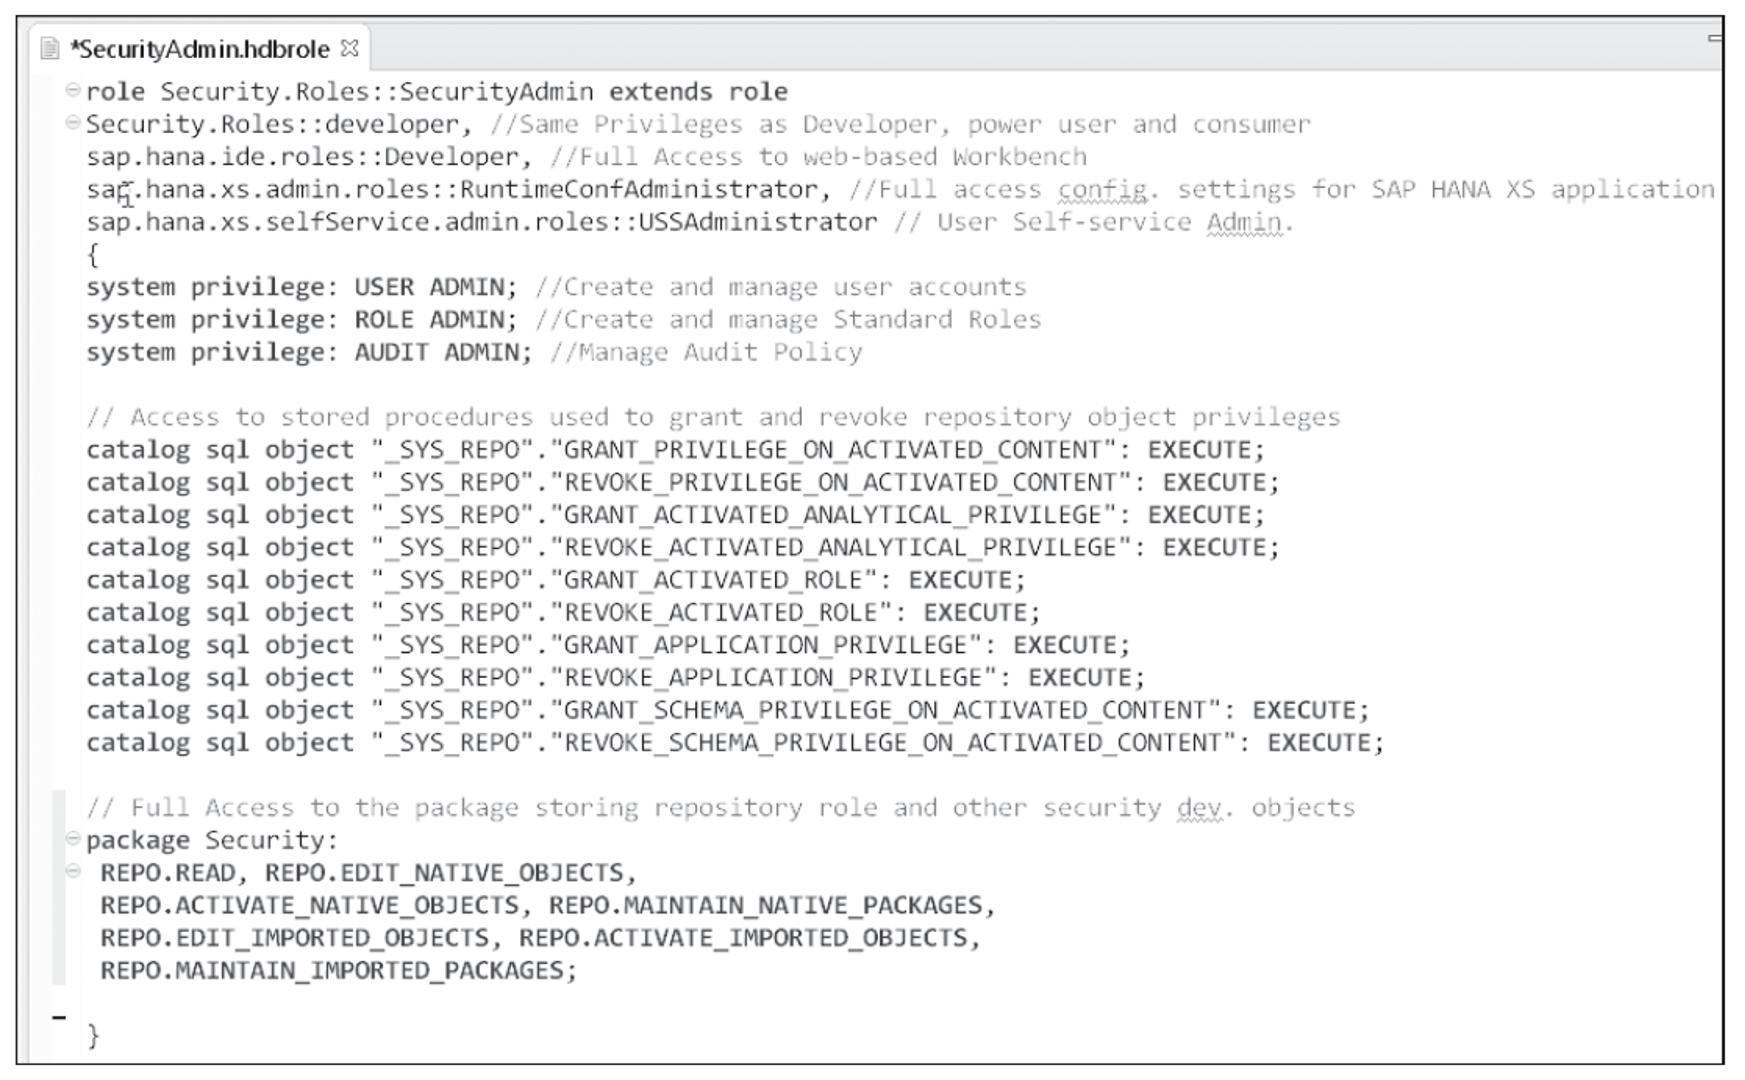 SecurityAdmin Repository Role Script